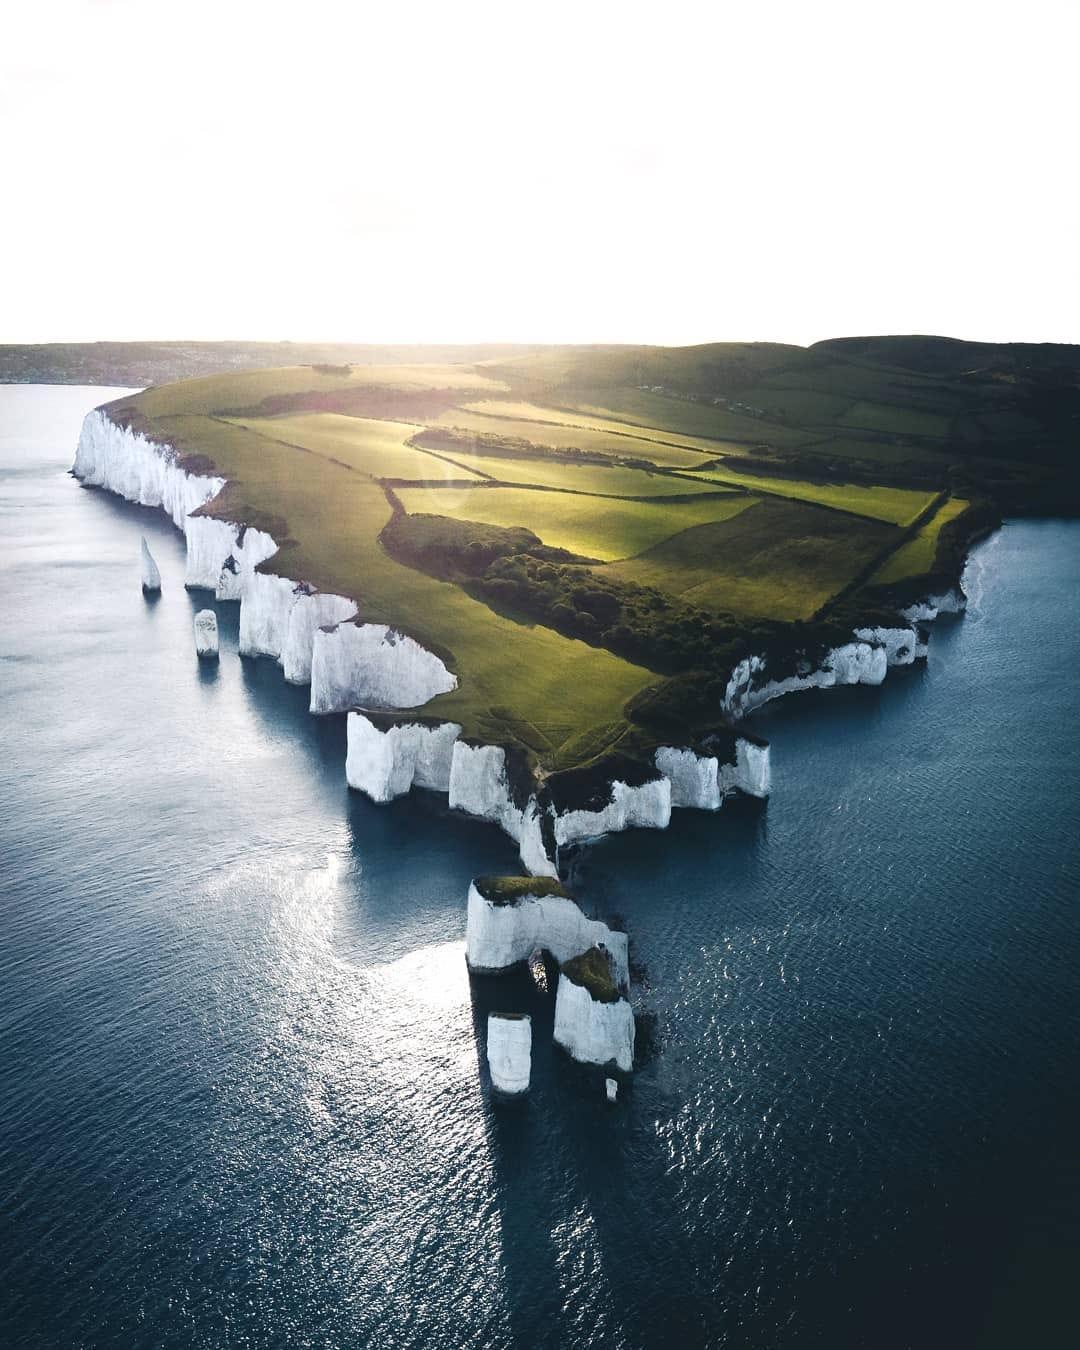 White cliffs of england